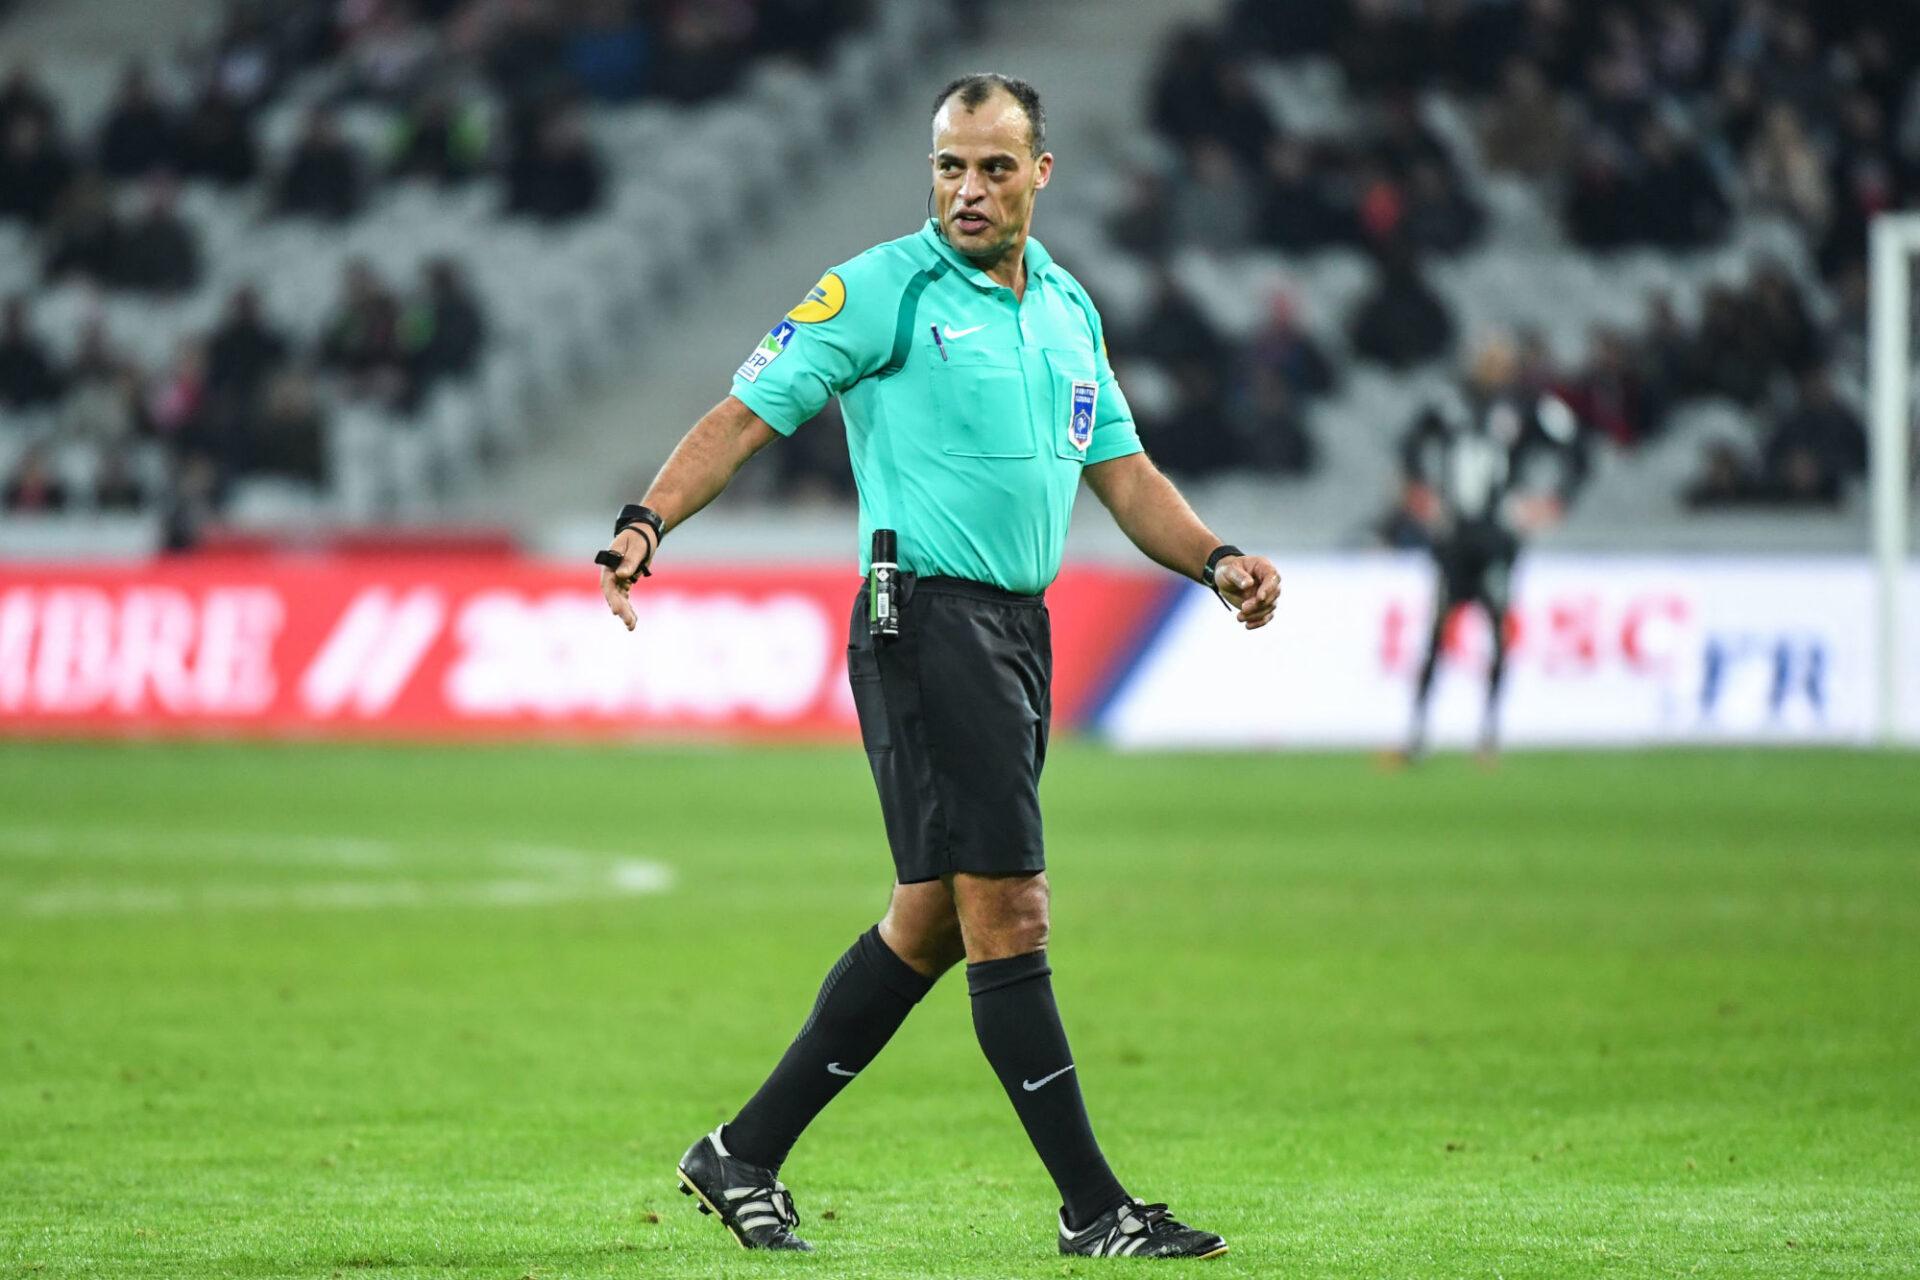 Saïd Ennjimi d'accord avec Clément Turpin (Photo by Anthony Dibon/Icon Sport)